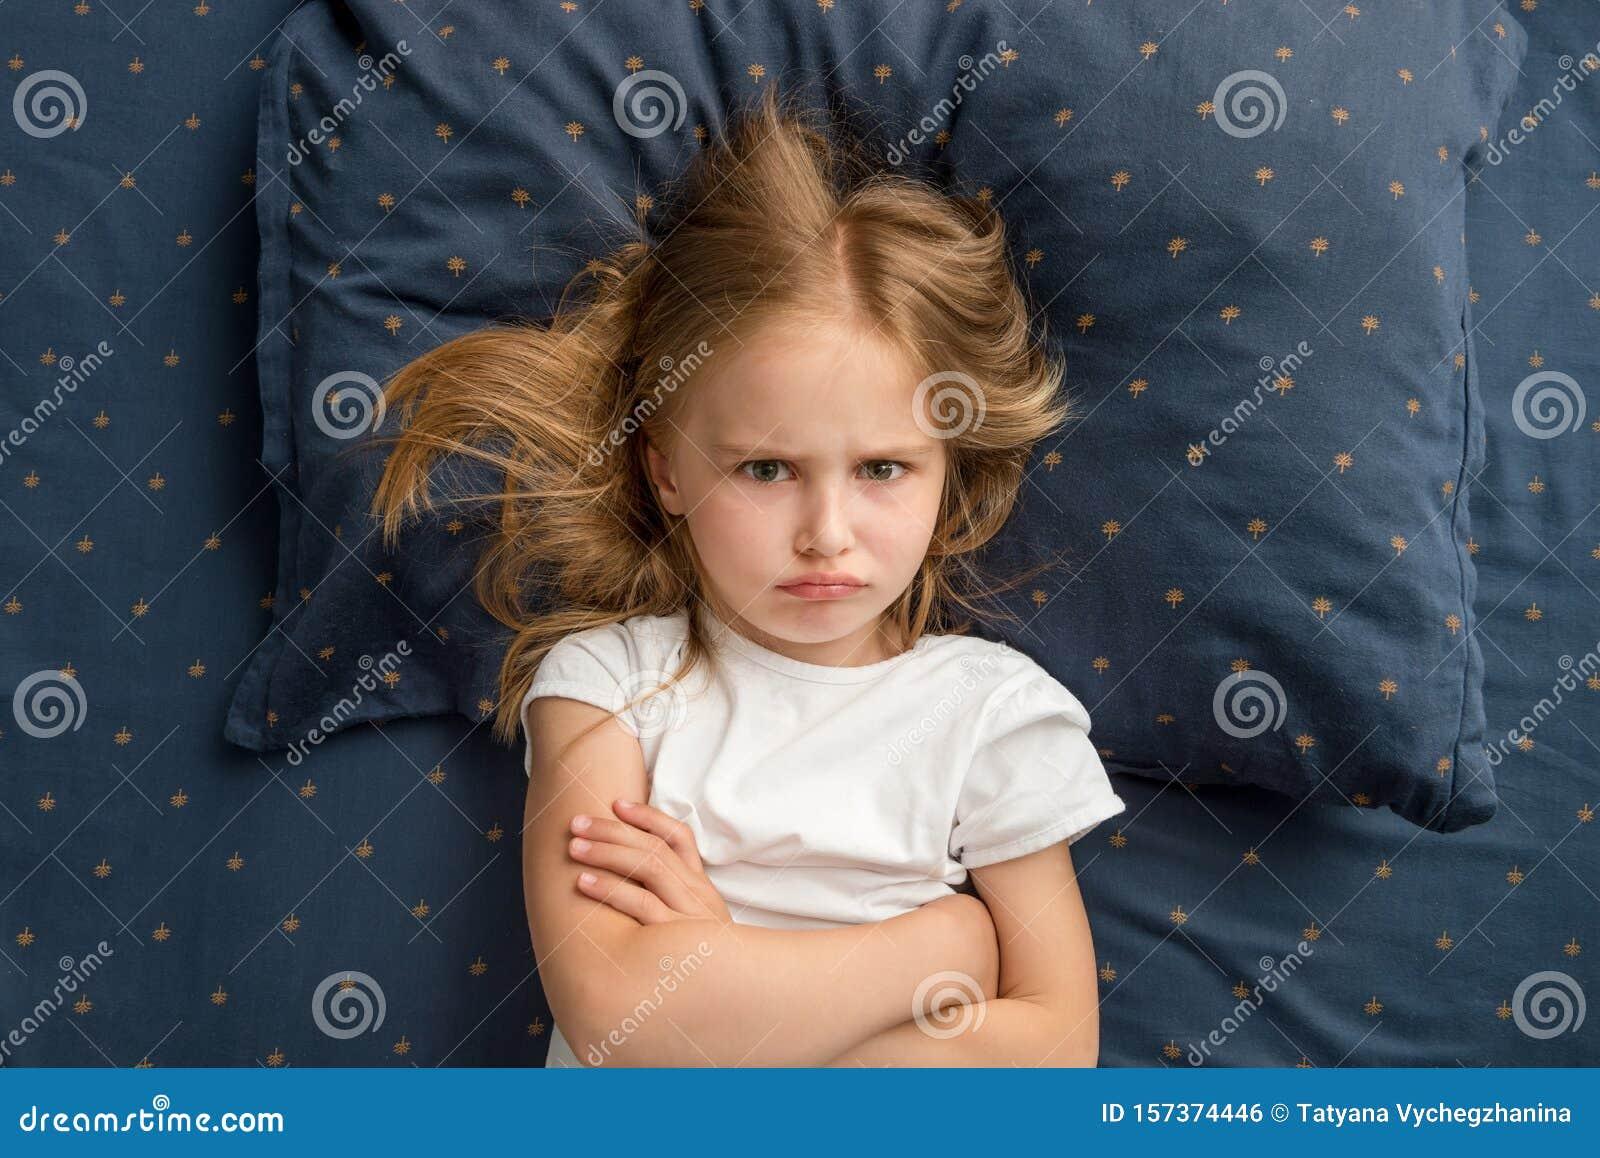 Child Girl Lying On The Bed Refuses To Sleep Stock Photo ...